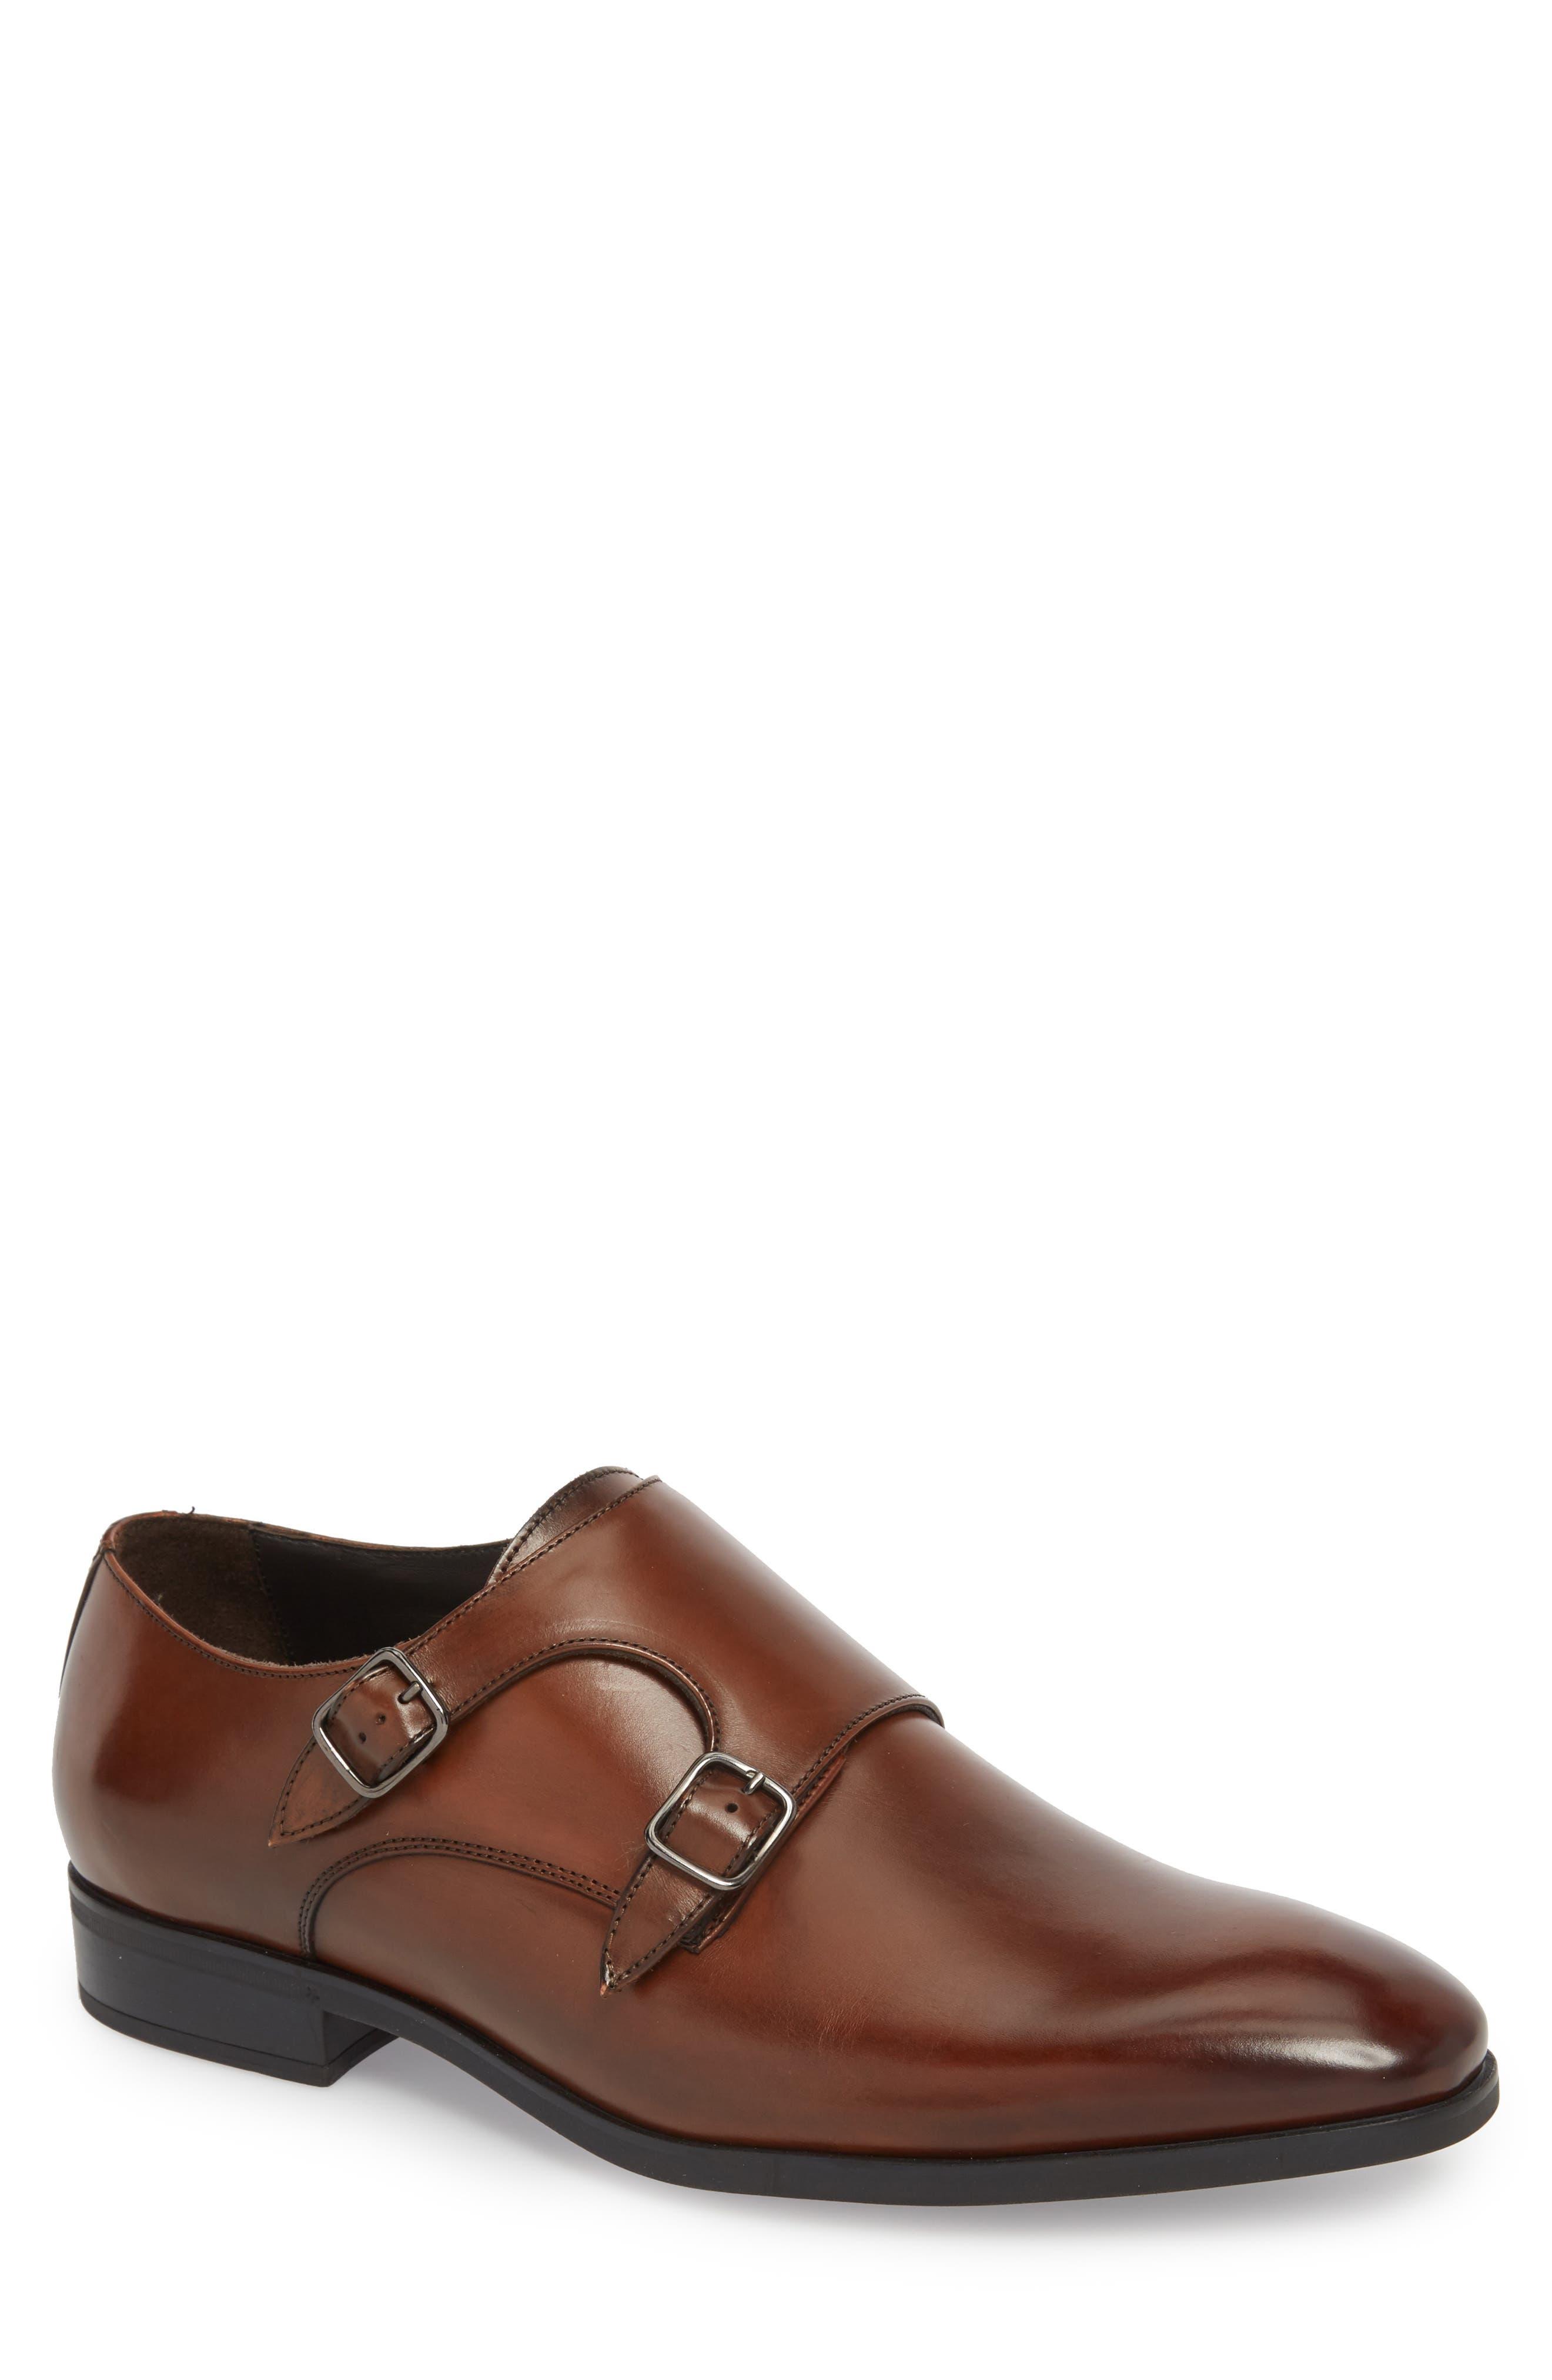 Benjamin Double Monk Strap Shoe,                         Main,                         color, TMORO LEATHER